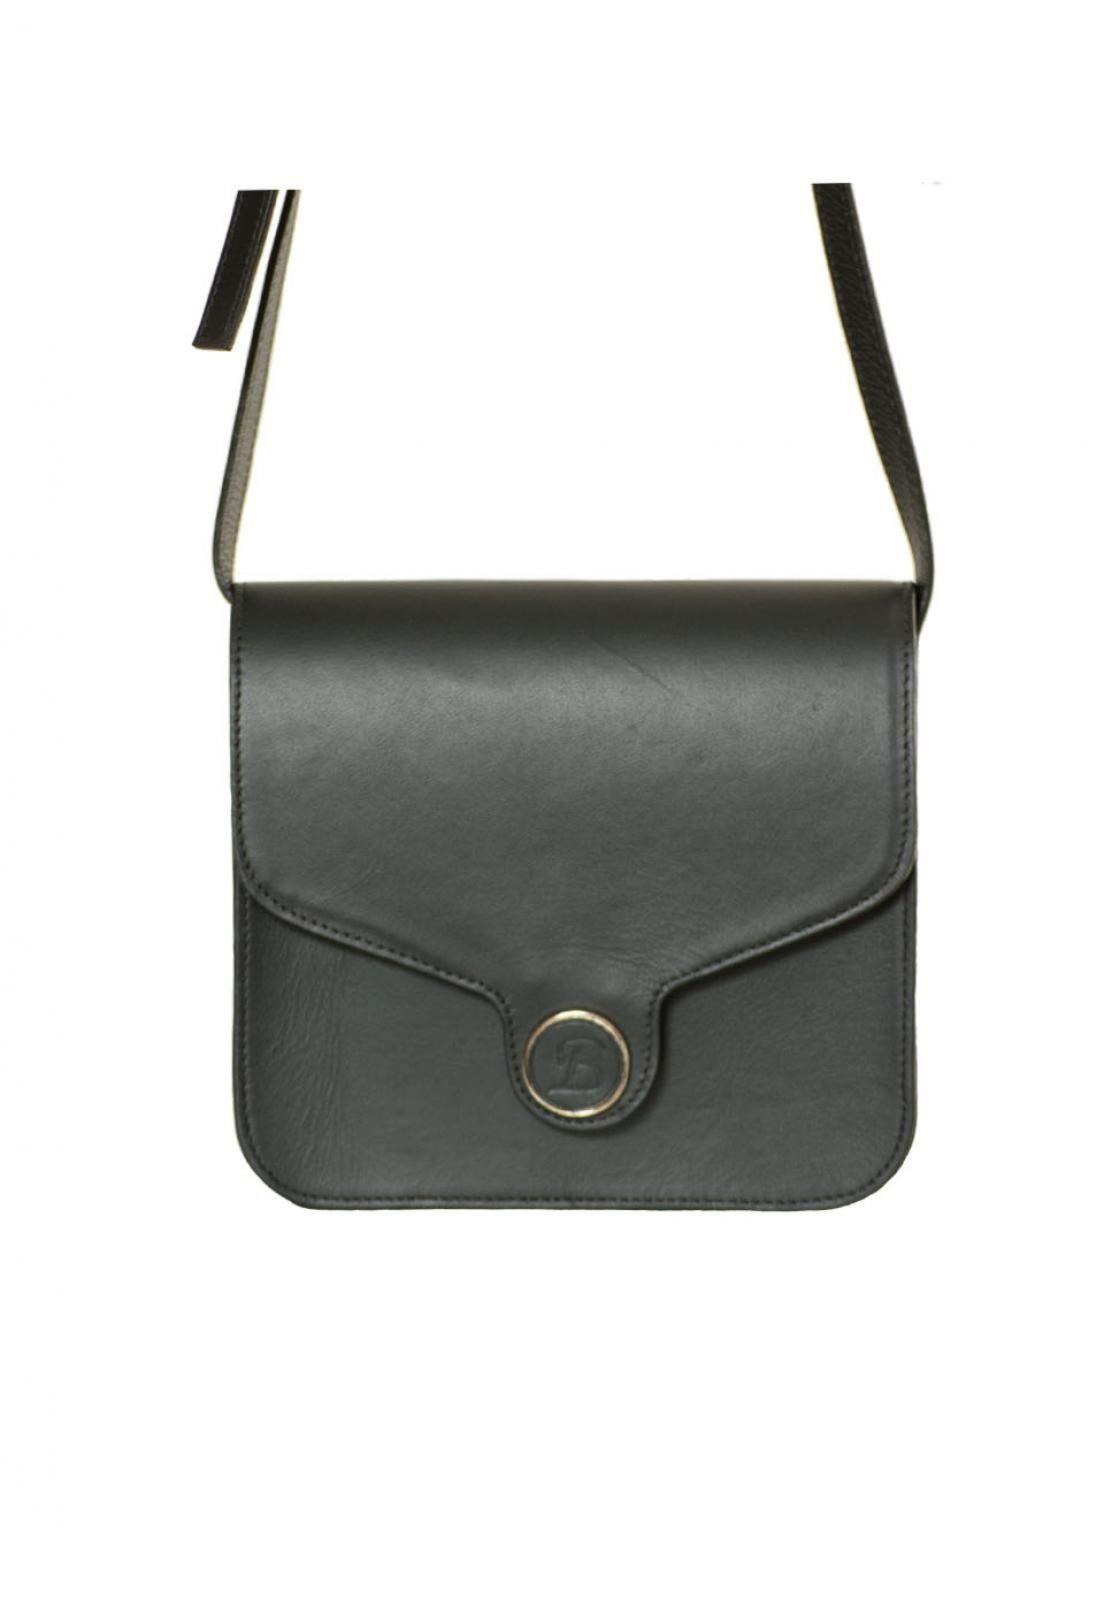 9c737159a Bolsa La Bijorca Pequena Preto | Products | Bolsas, Couro liso e Preto